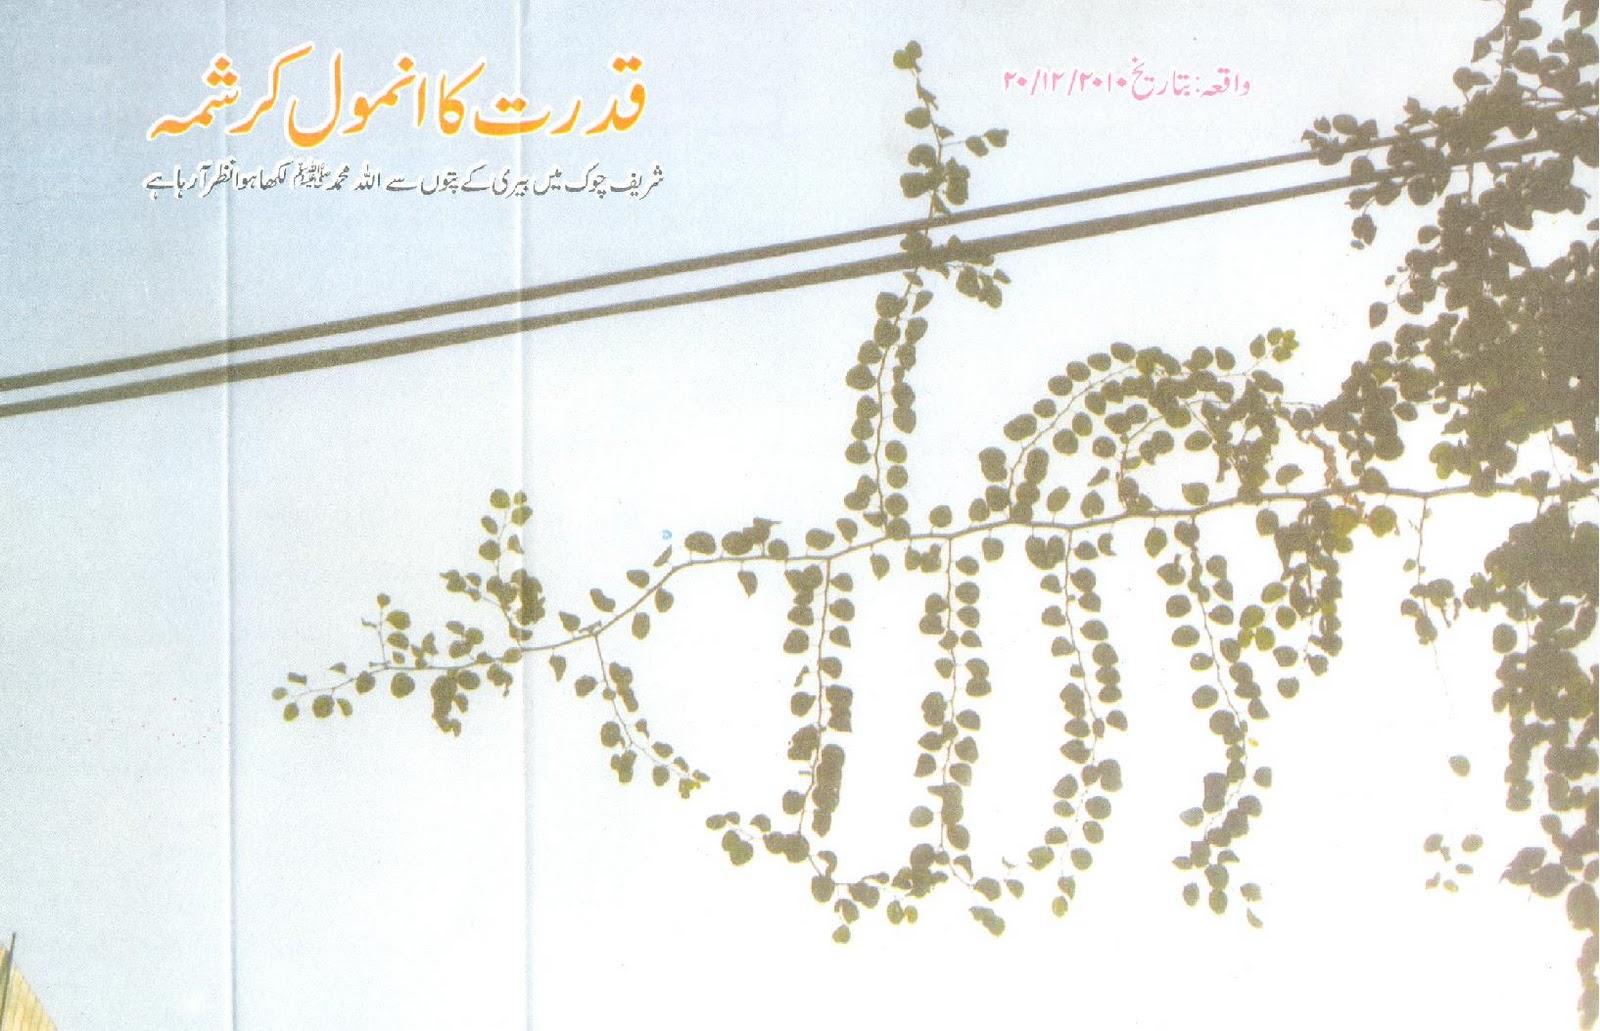 http://3.bp.blogspot.com/_VgXaDXiFvX4/TR8EwMiCNDI/AAAAAAAABA0/ohjbT4a2o9E/s1600/Allah+Muhammad+Names+appear+on+tree%2527s+leaves.+Masha+Allah.JPG